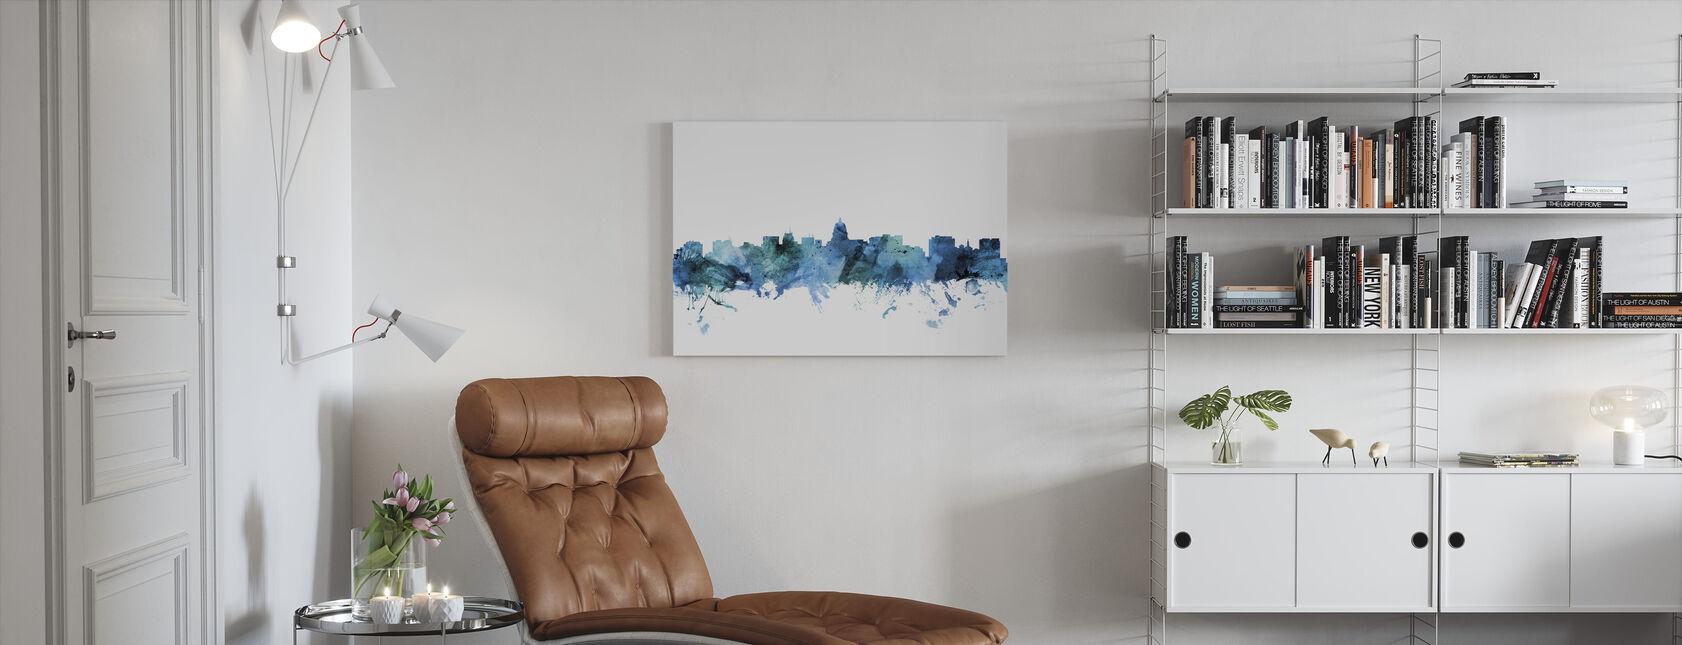 Skyline van Madison Wisconsin - Canvas print - Woonkamer